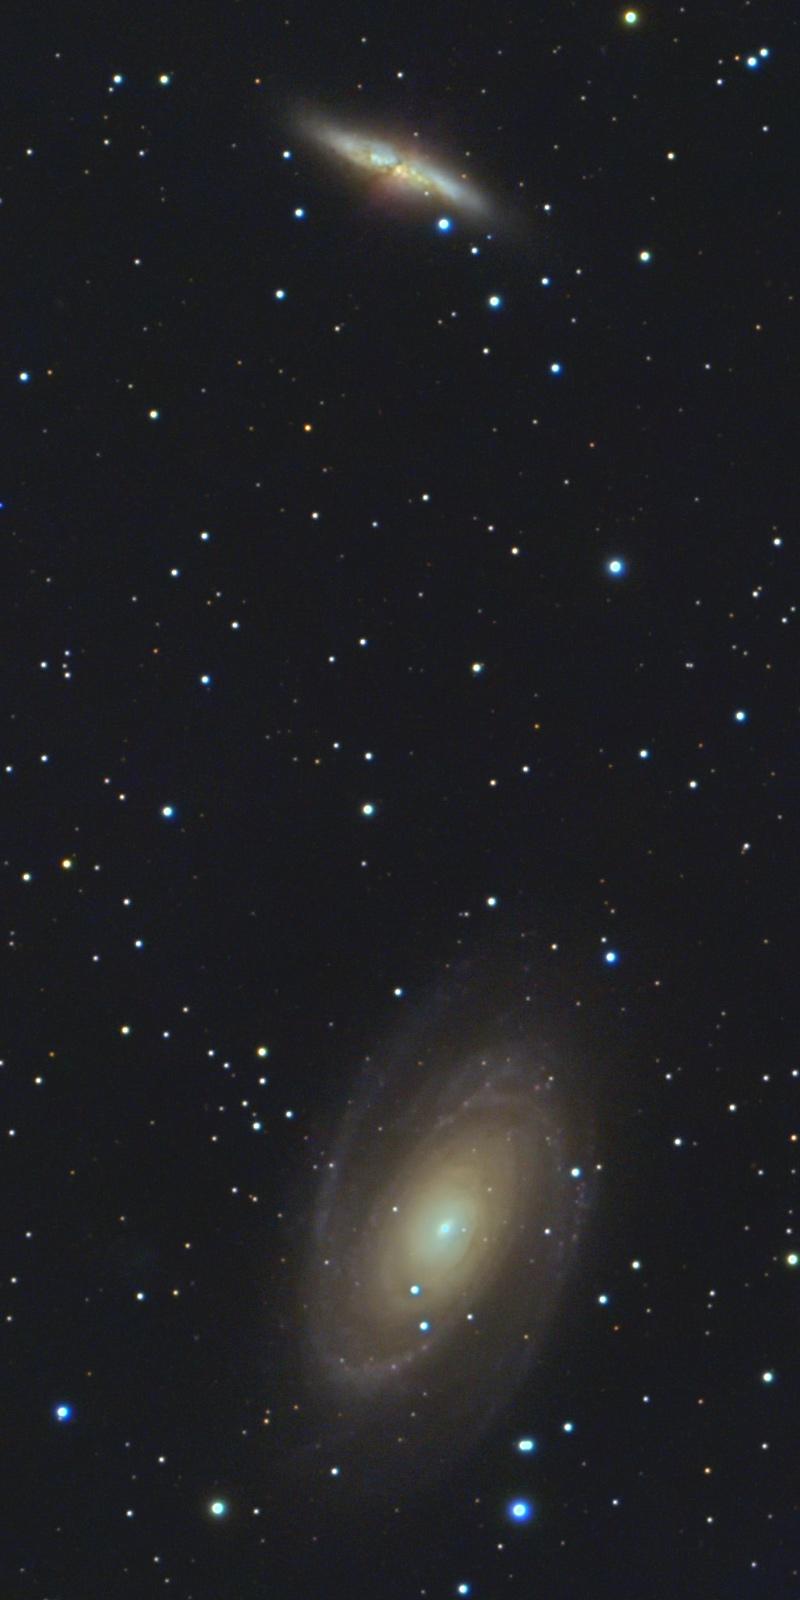 M81_m82_fs60asi385mc_264x30sec